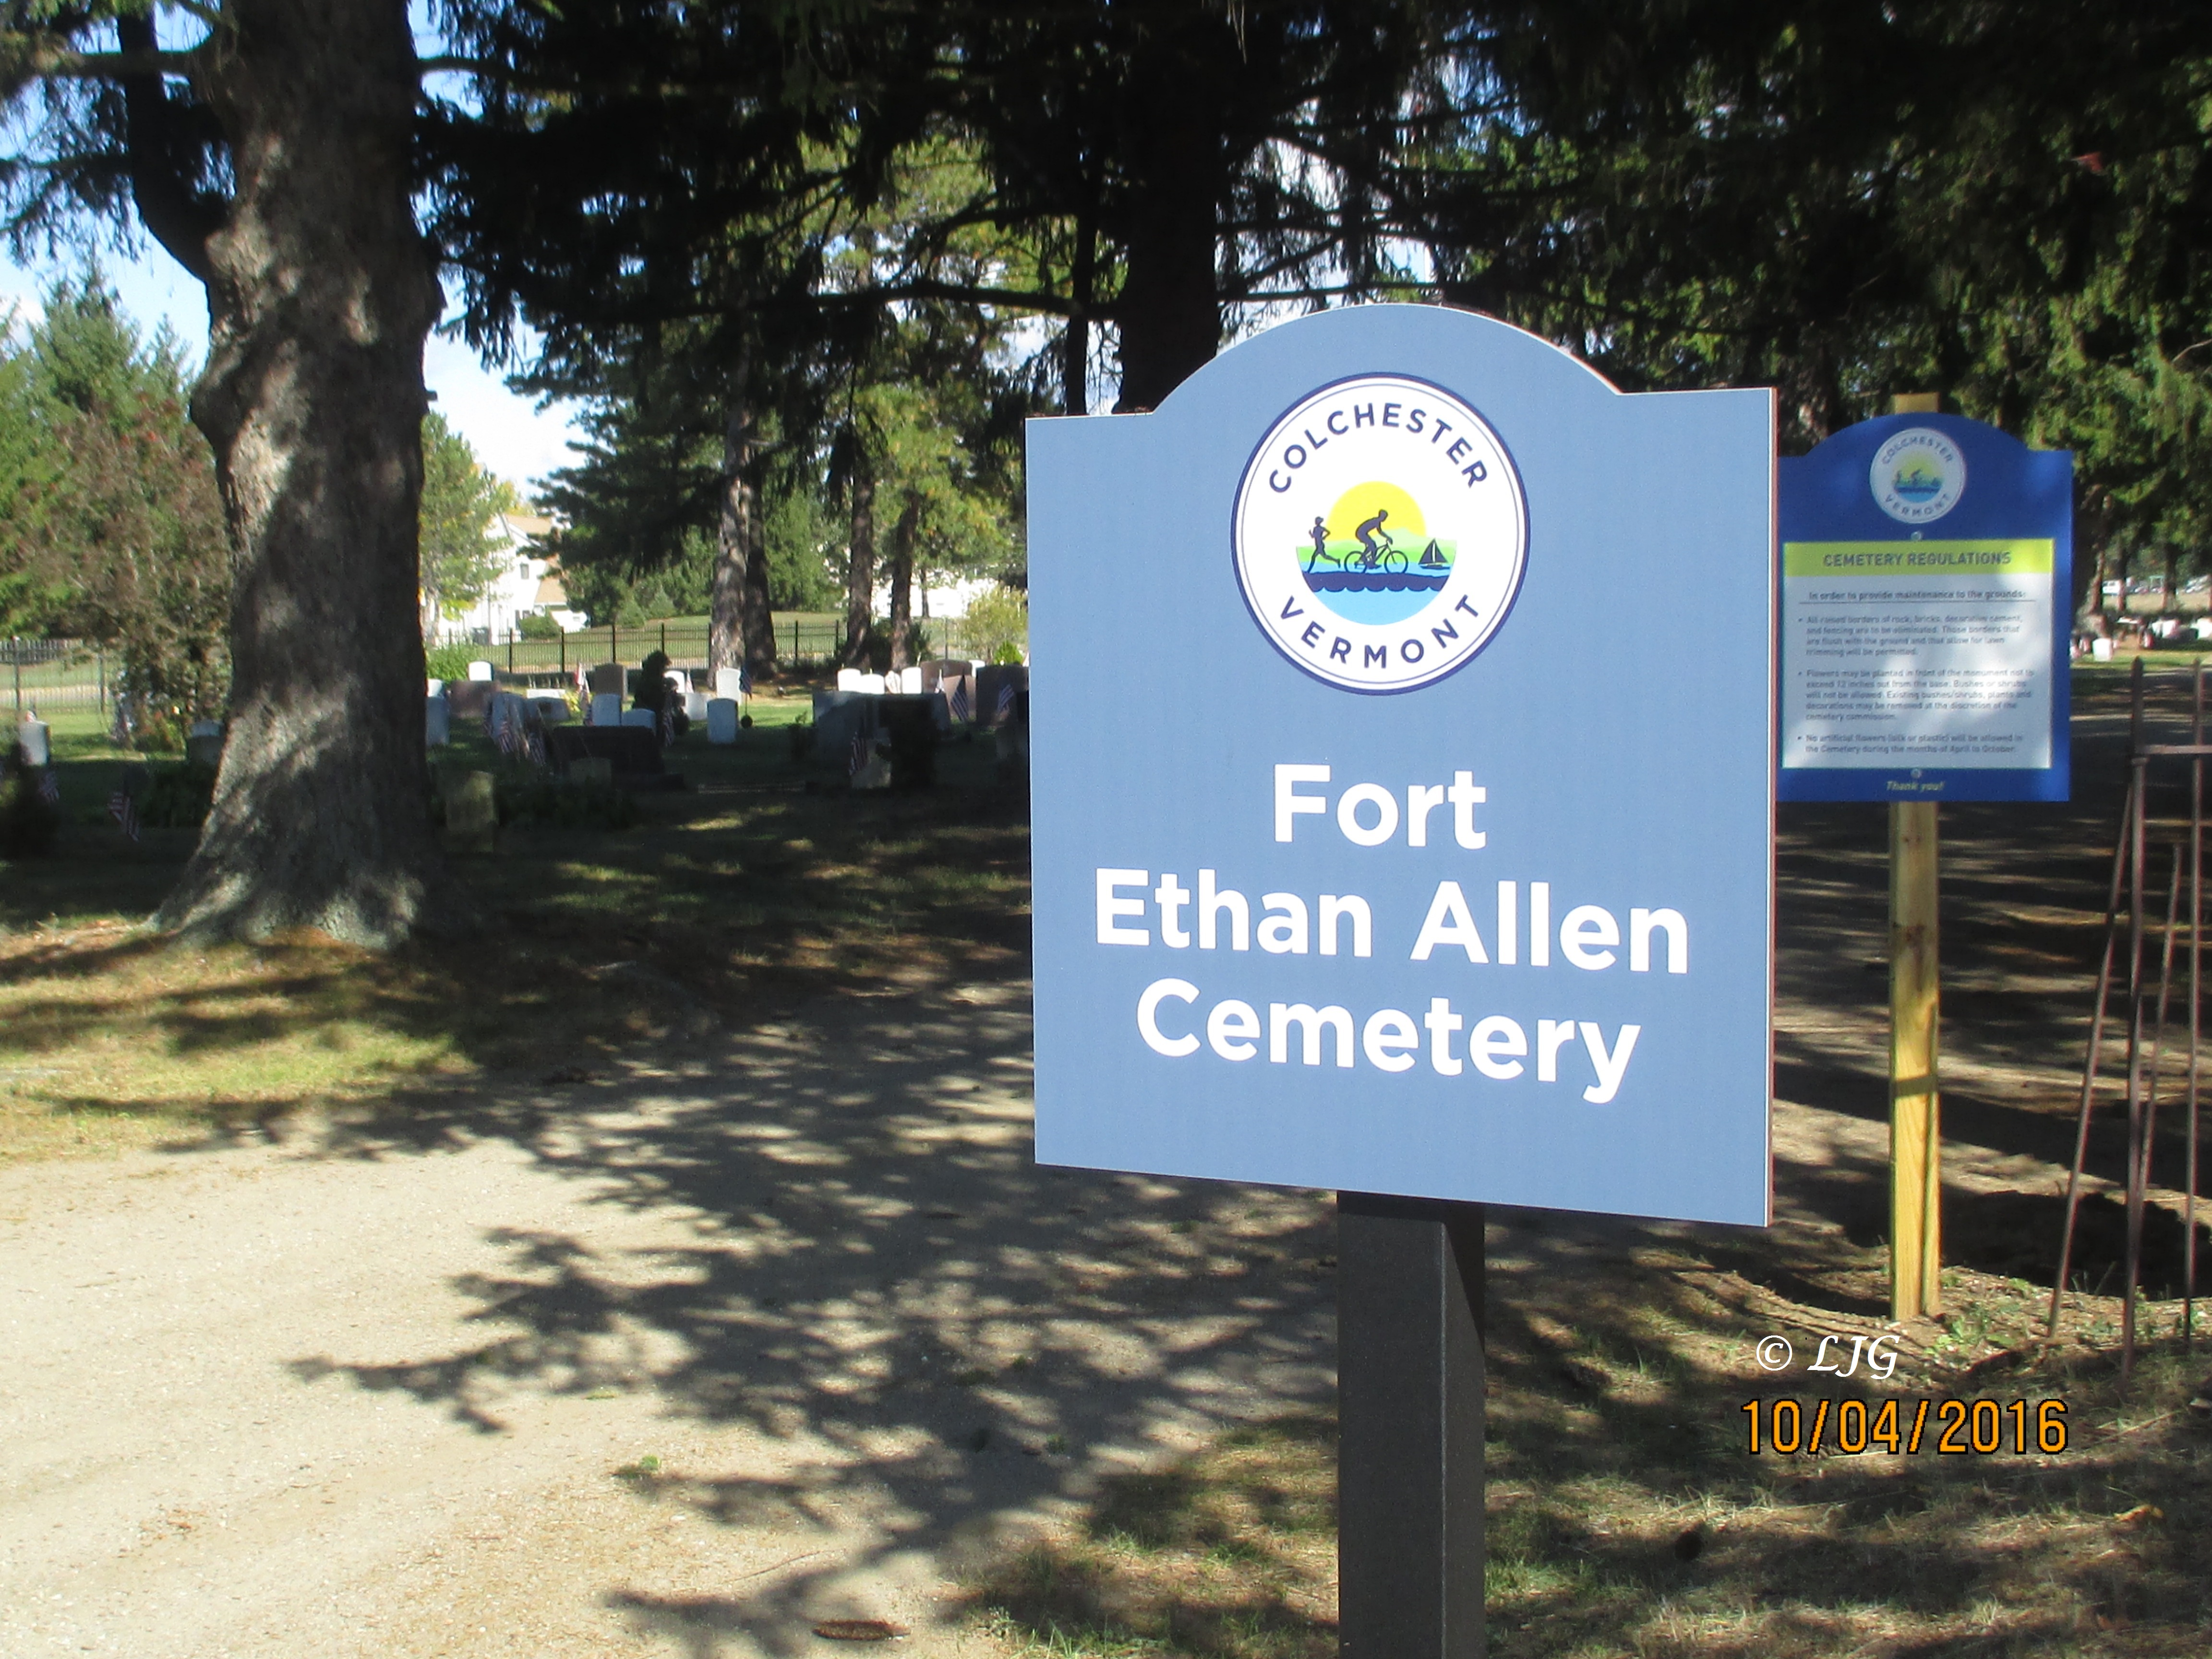 Fort Ethan Allen Cemetery